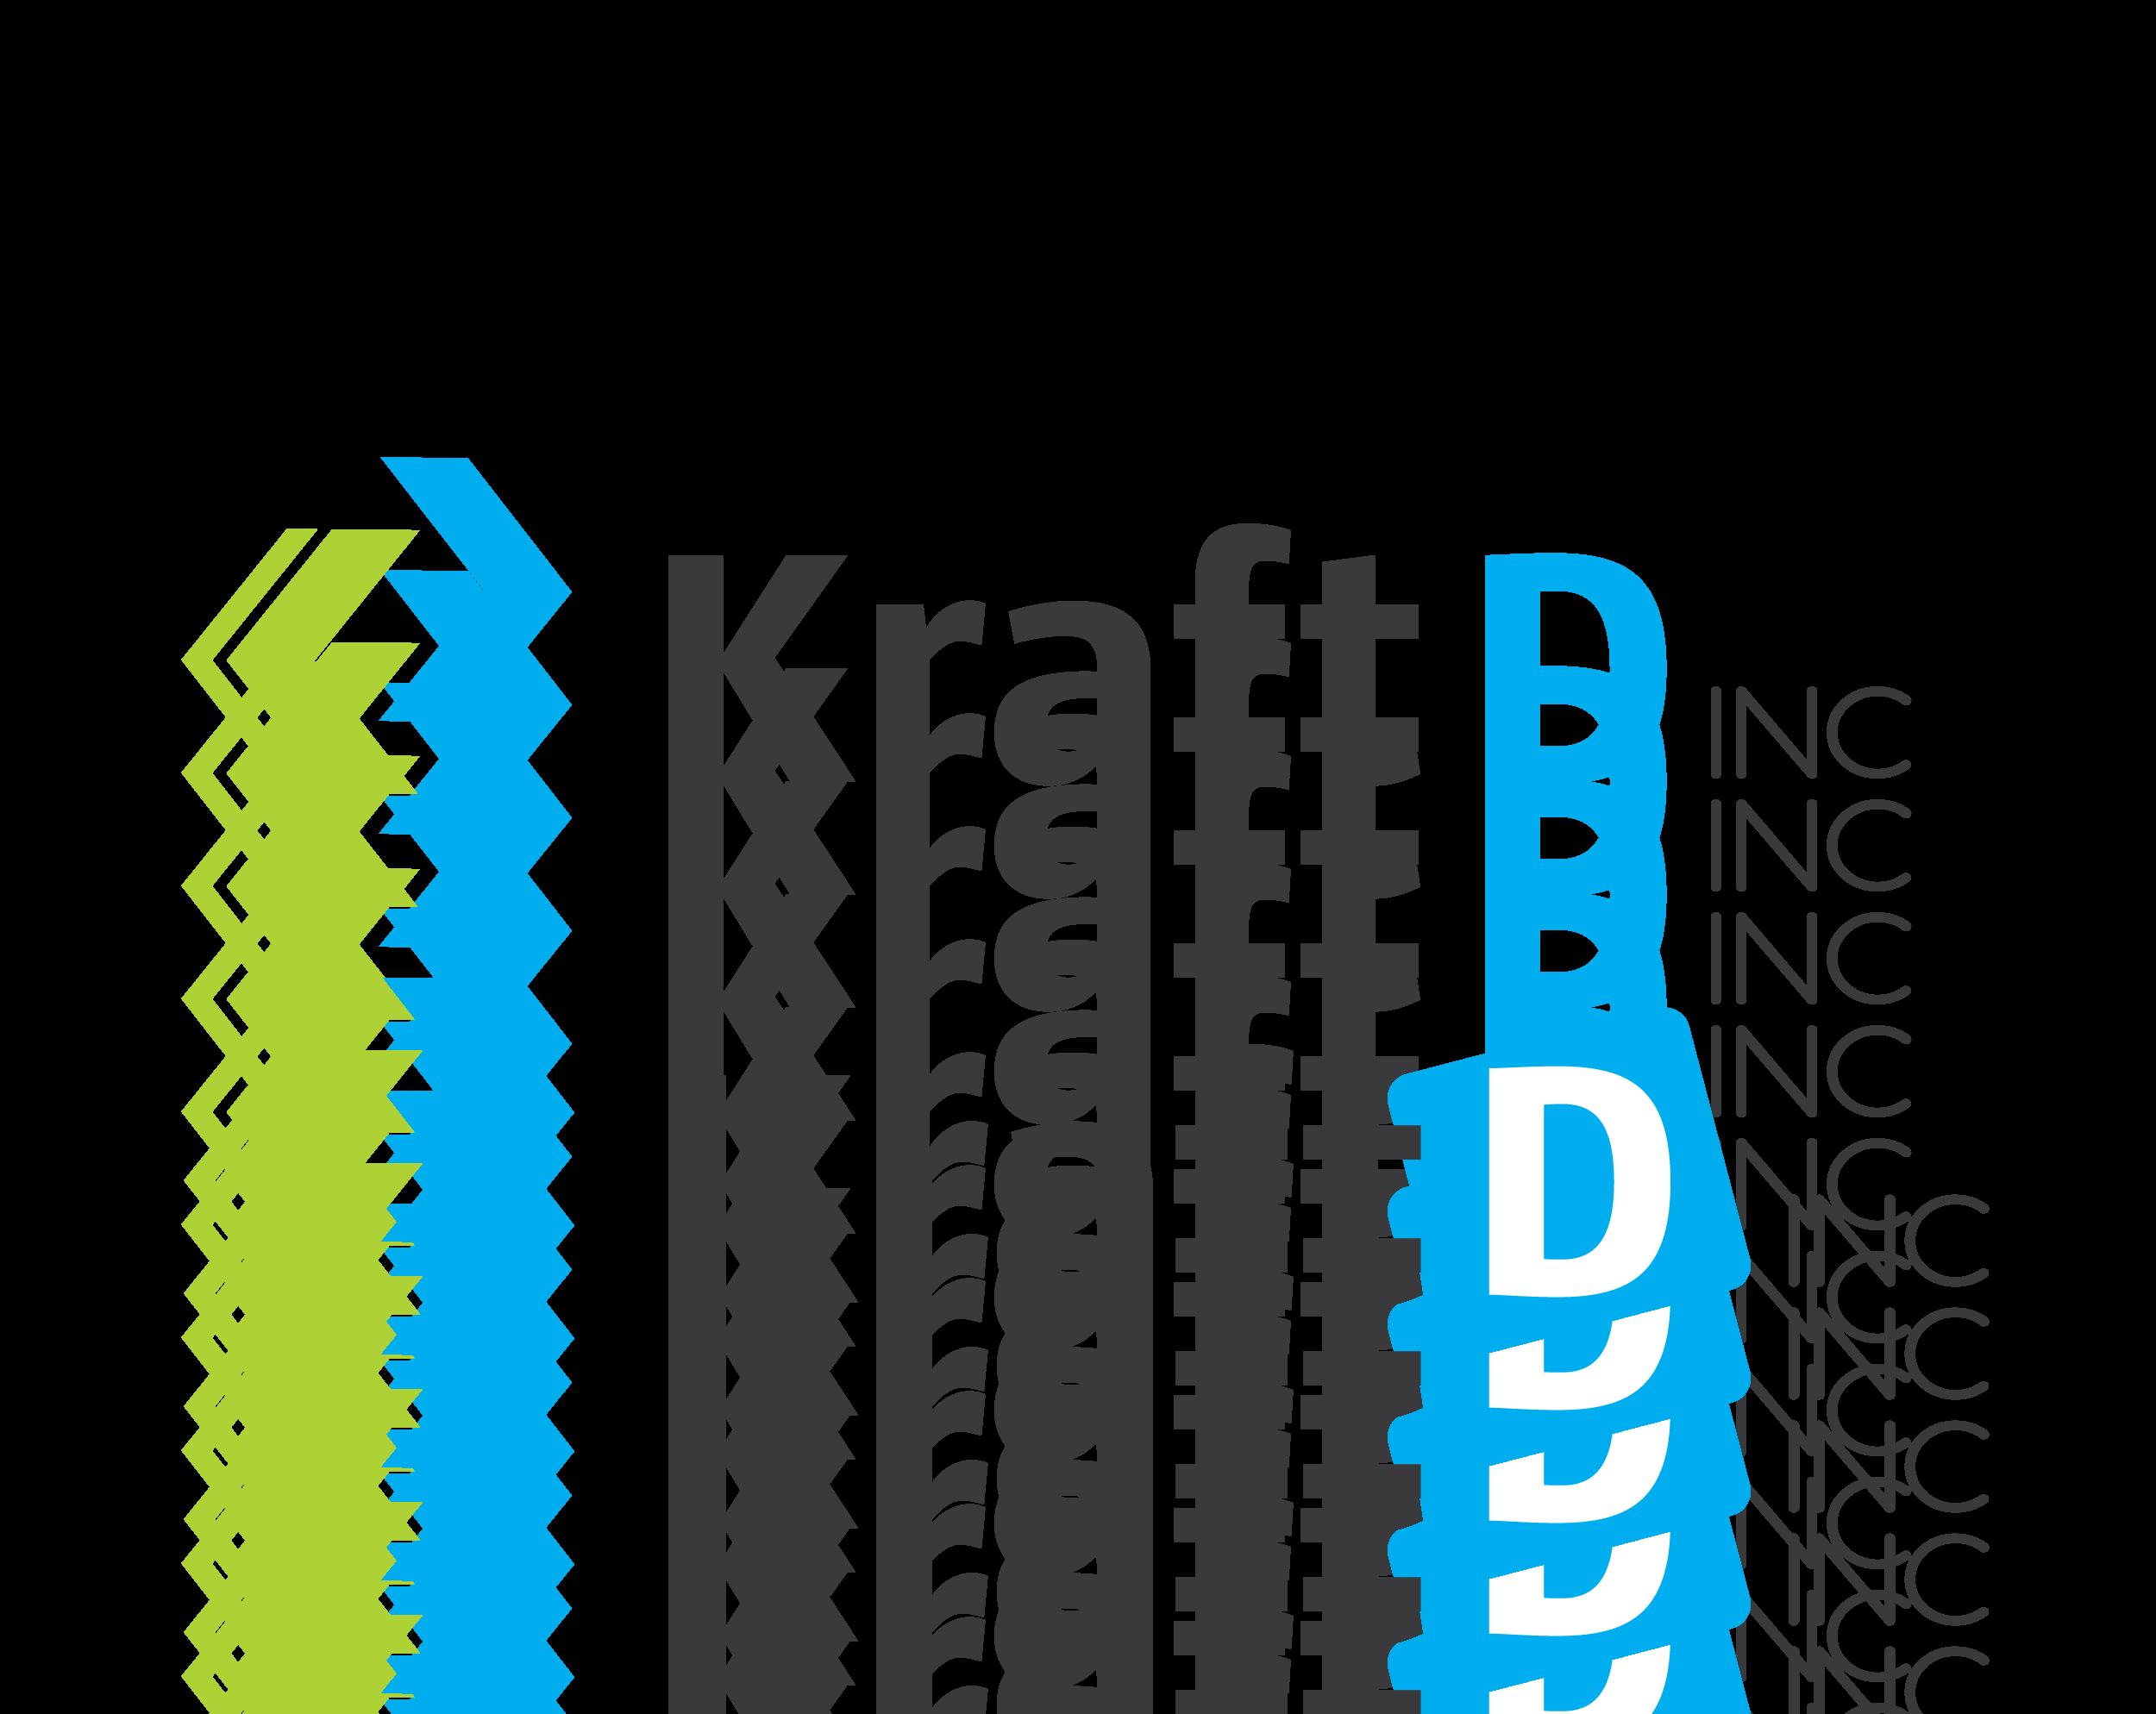 Logo Design by 354studio - Entry No. 418 in the Logo Design Contest Unique Logo Design Wanted for Kraft D Inc.